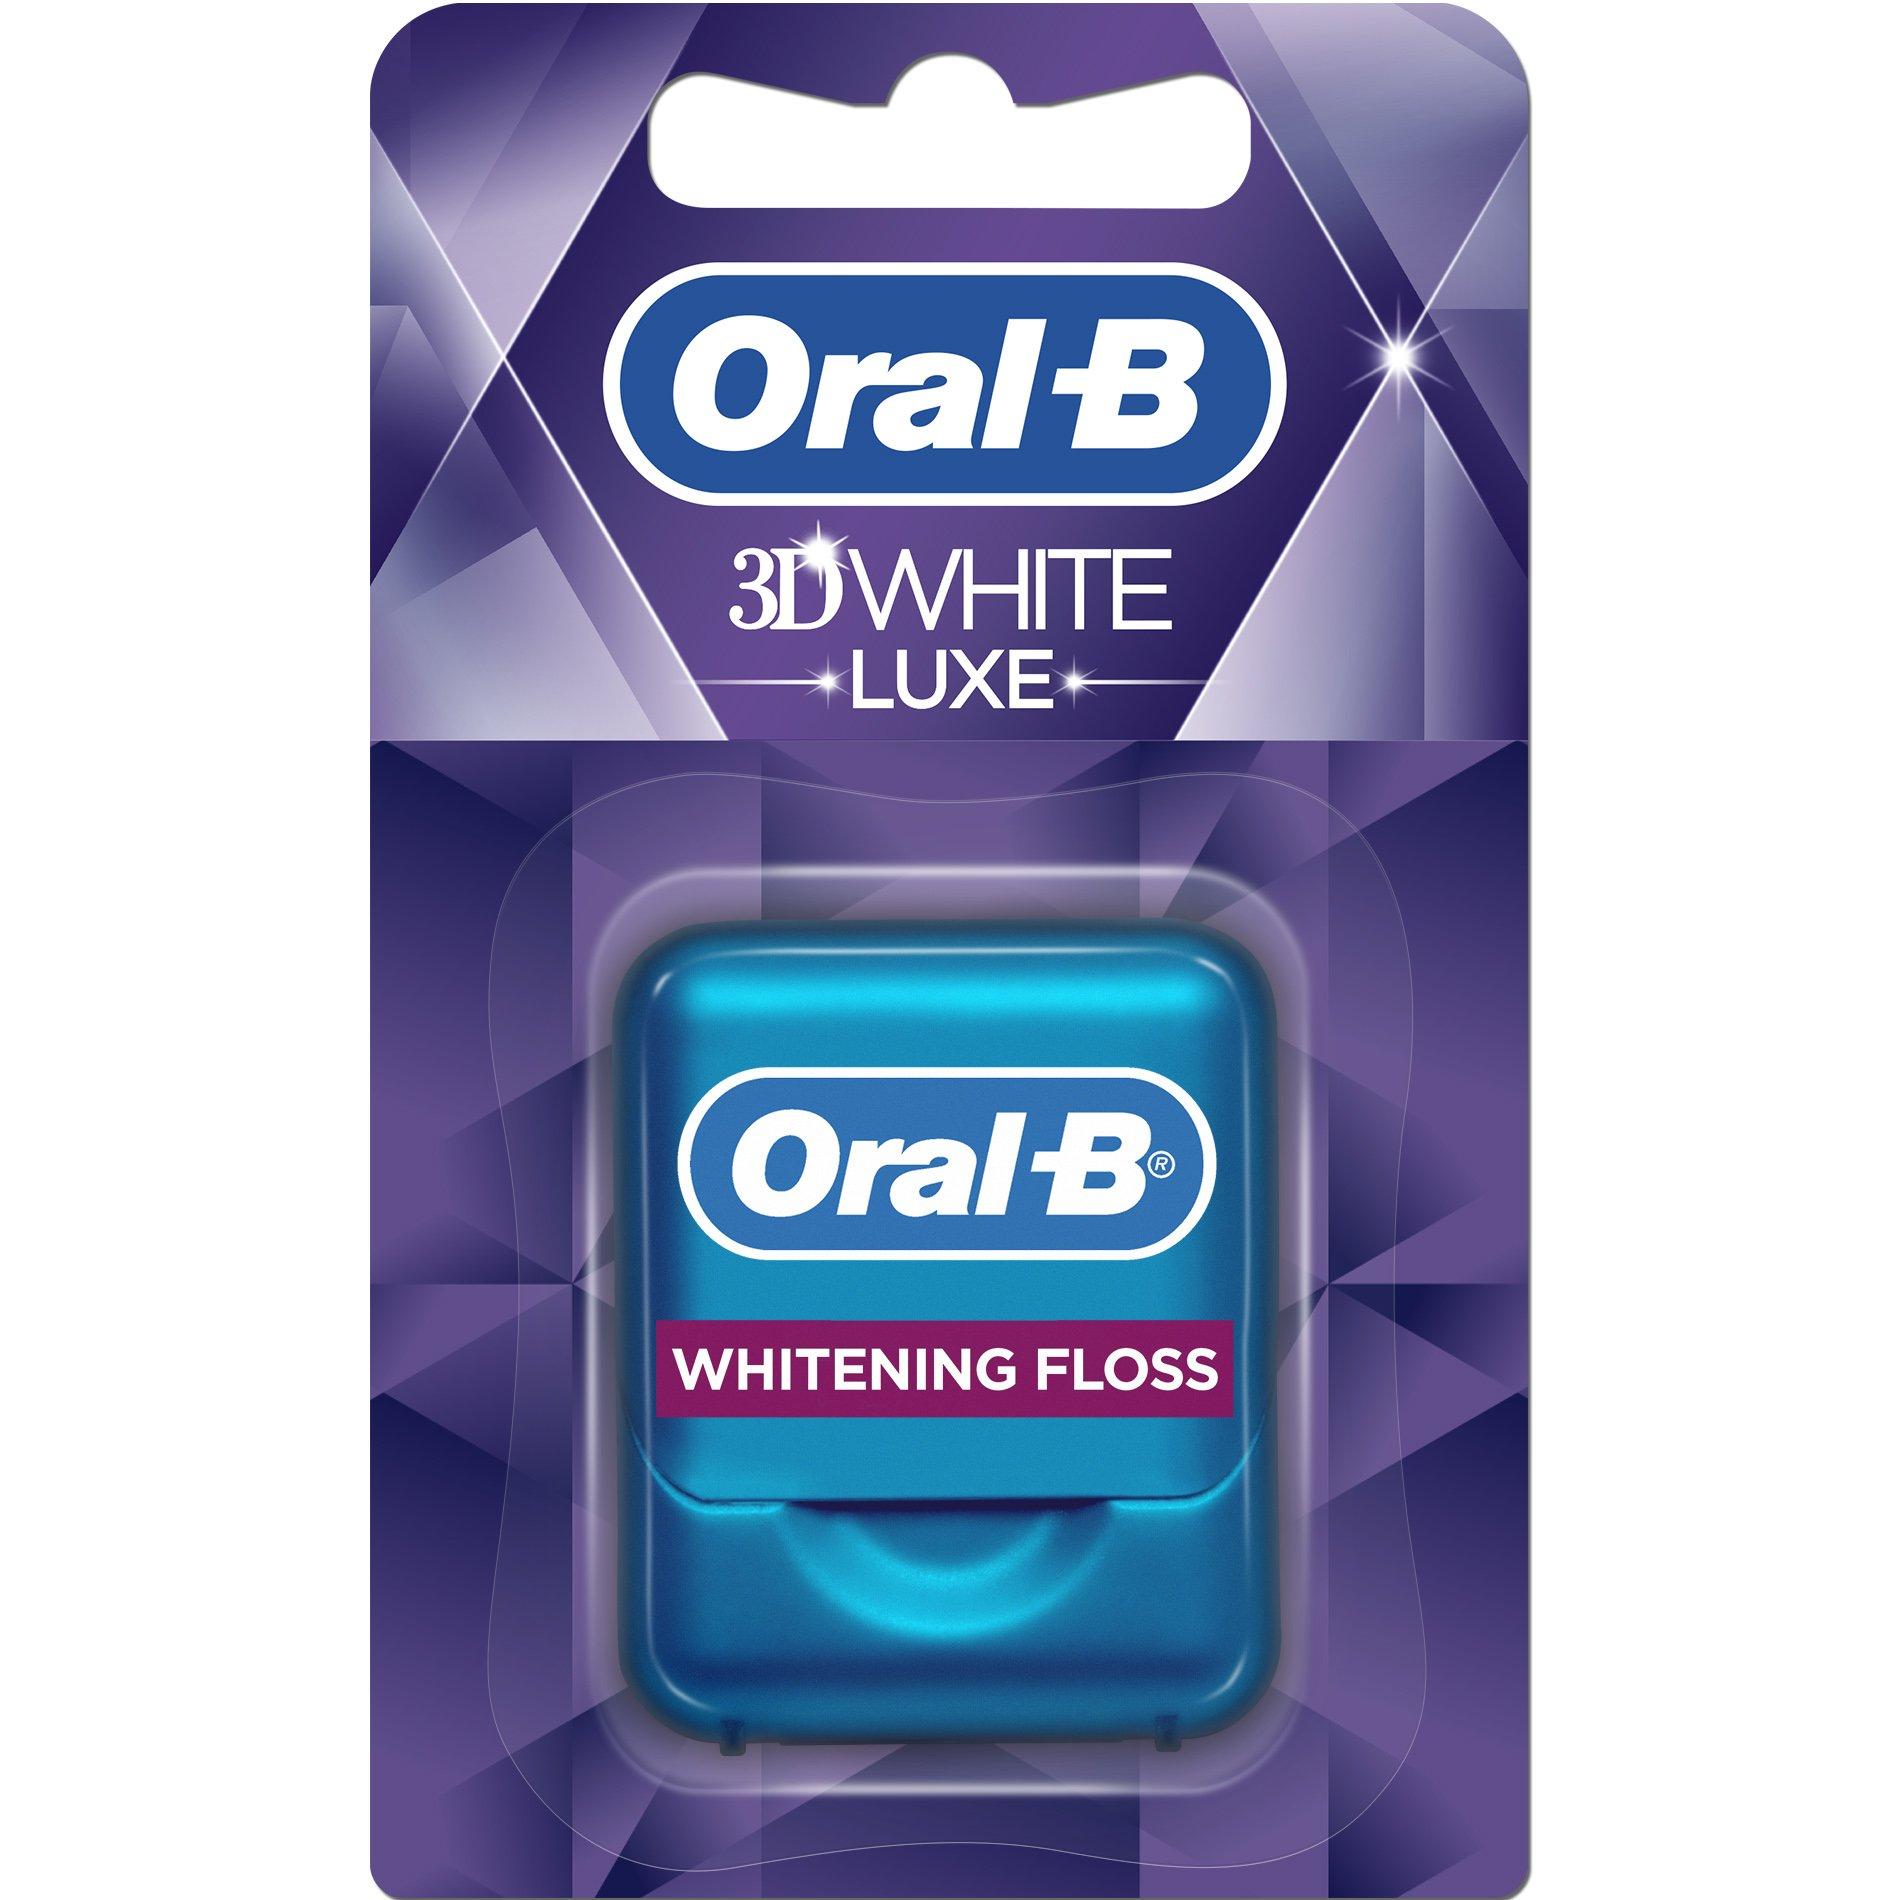 Oral-B 3D White Luxe Οδοντικό Νήμα για την Πρόληψη Λεκέδων 35m